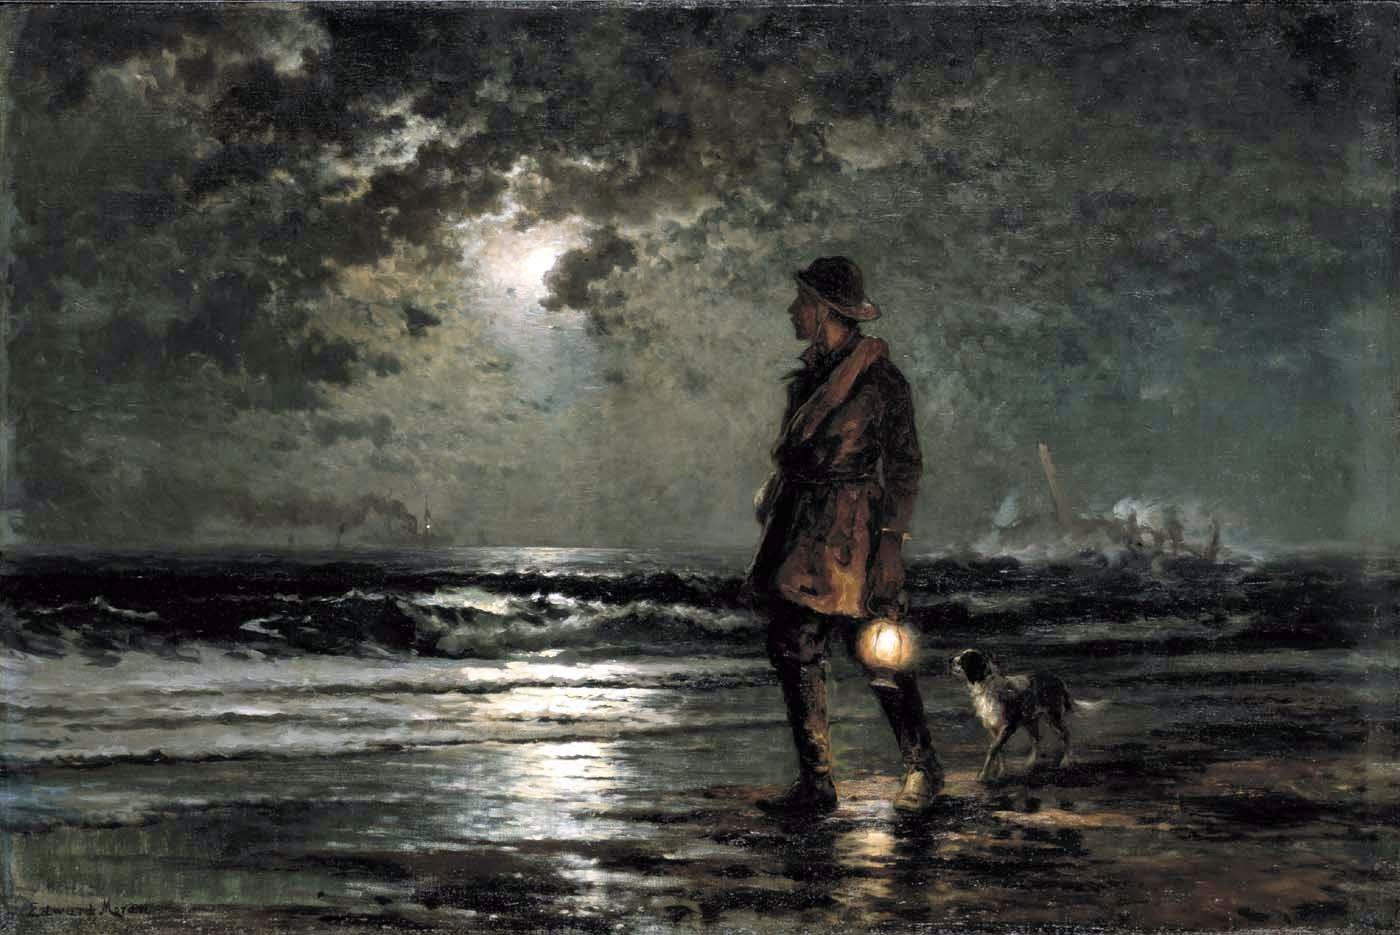 Aspiration Edward Hopper Painter Of Alienation